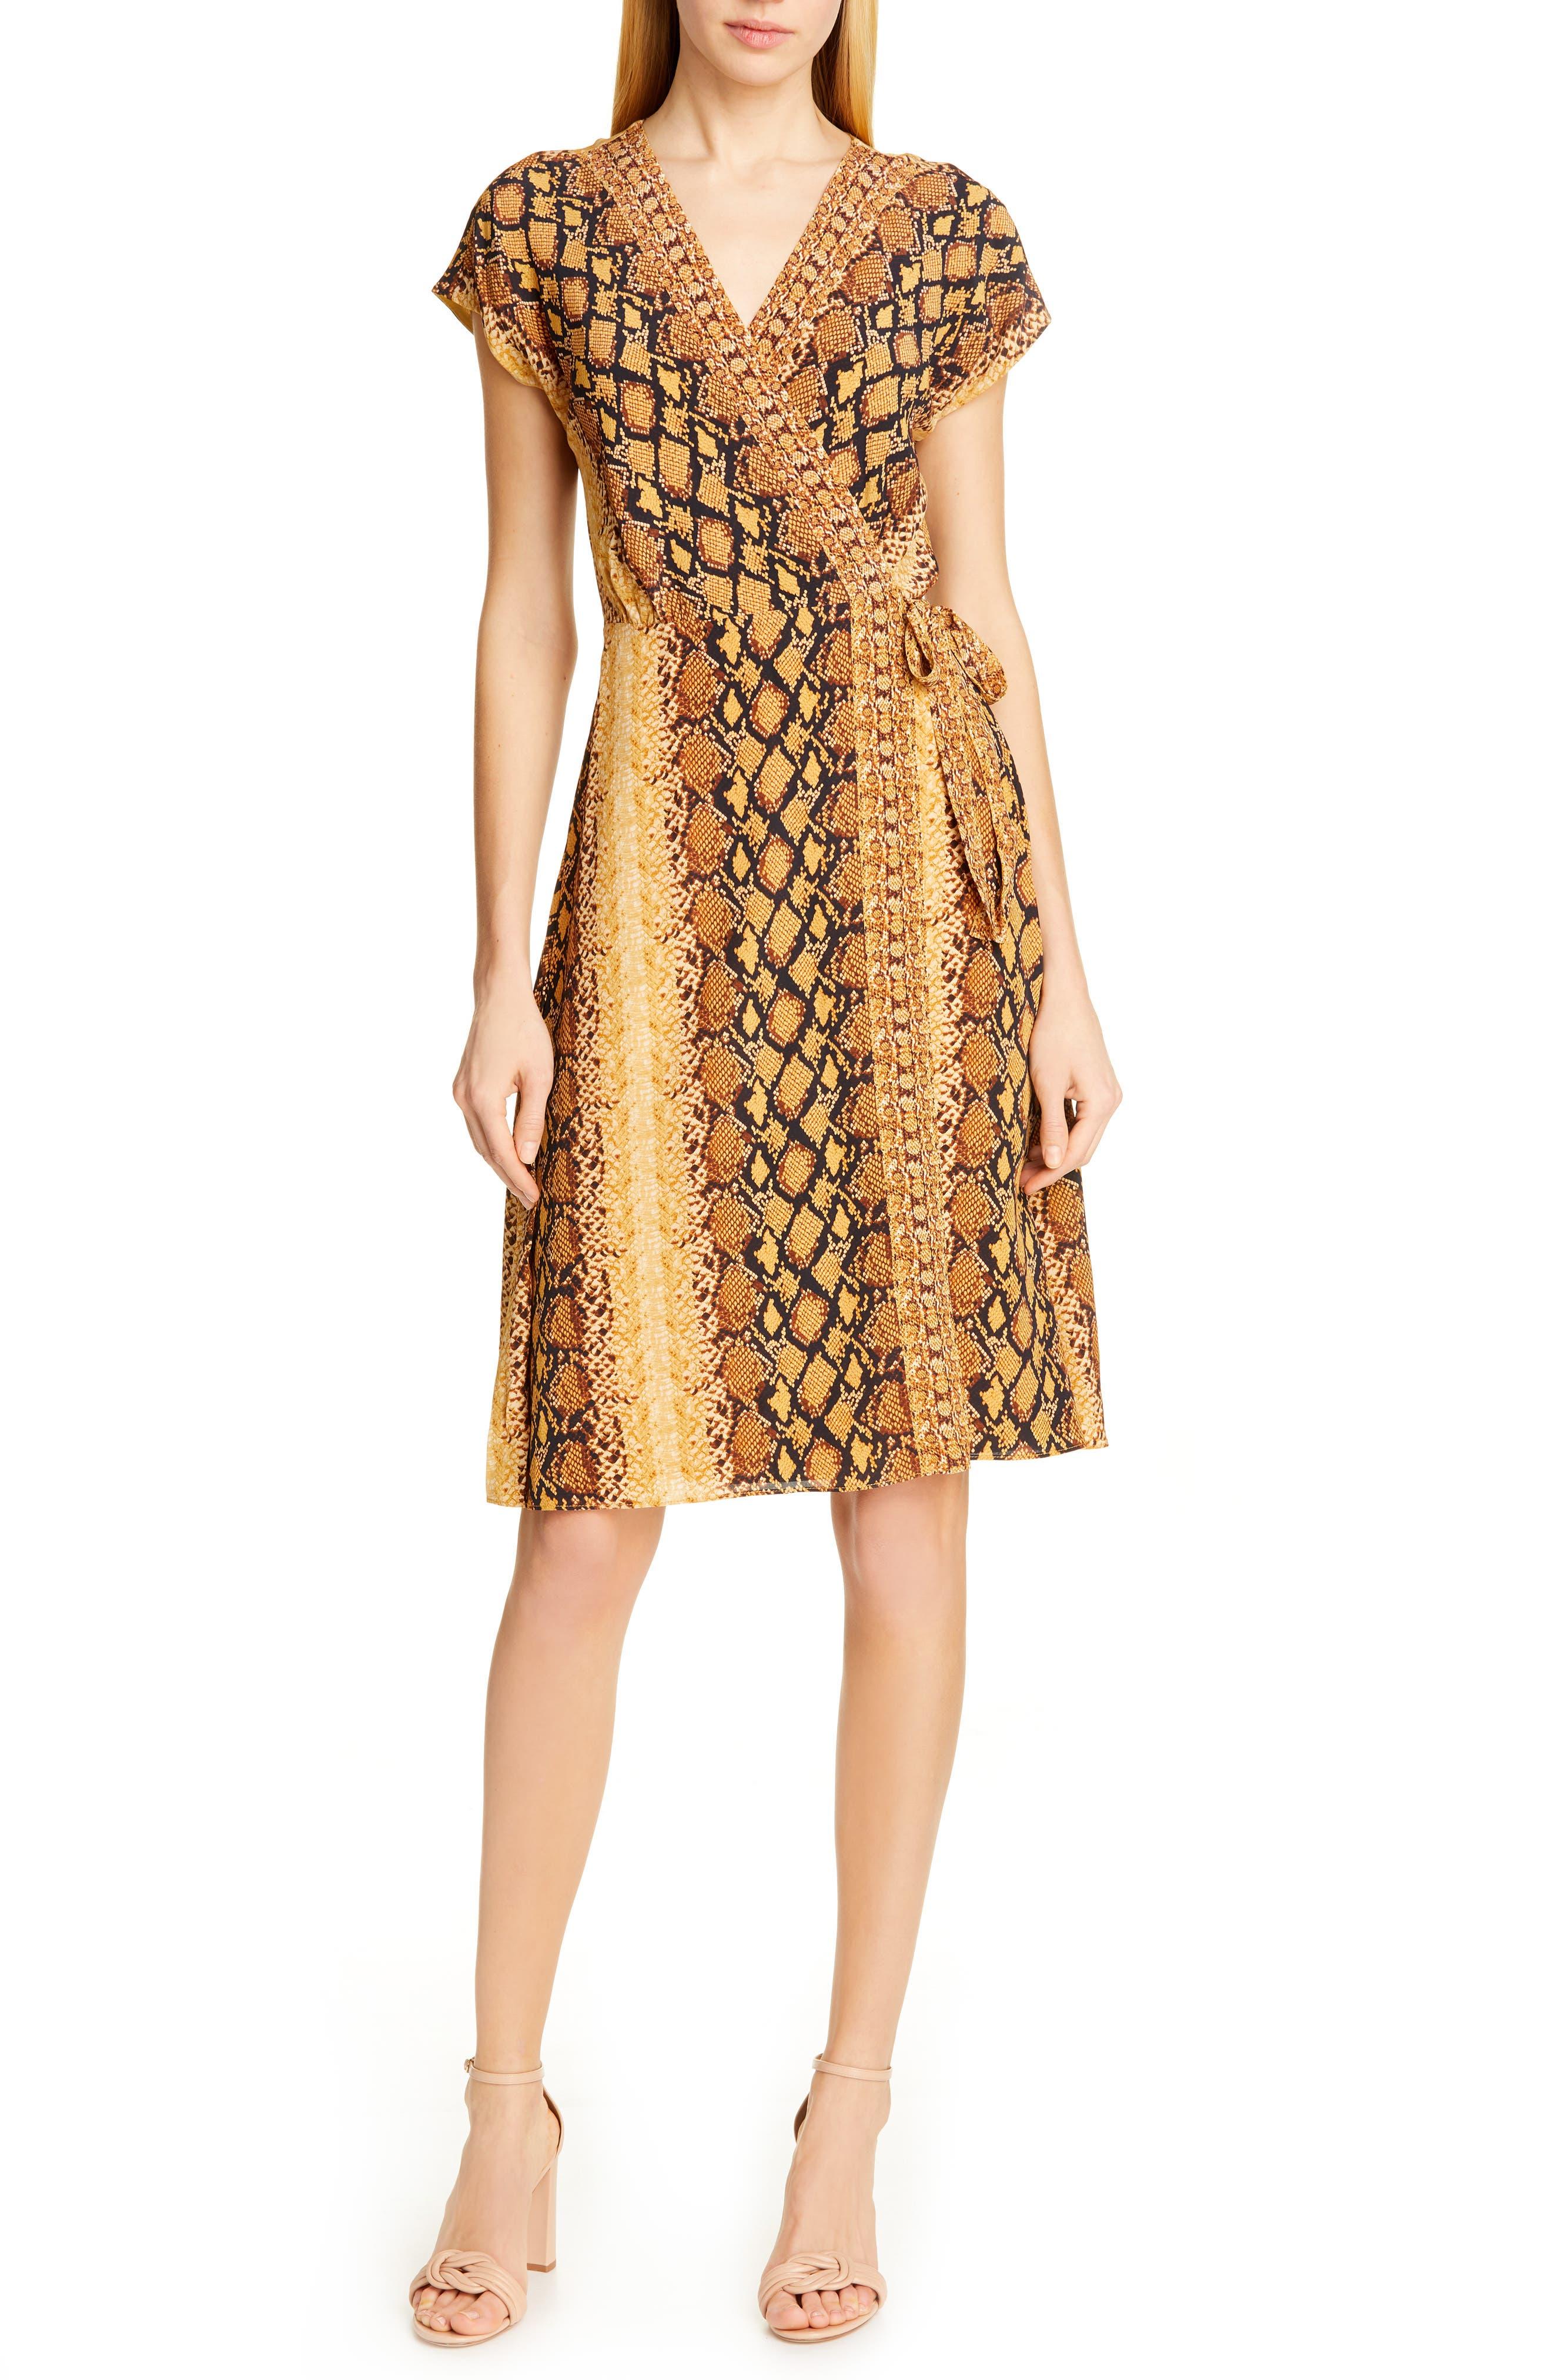 Bethwyn C Snakeskin Print Wrap Style Dress, Main, color, 720